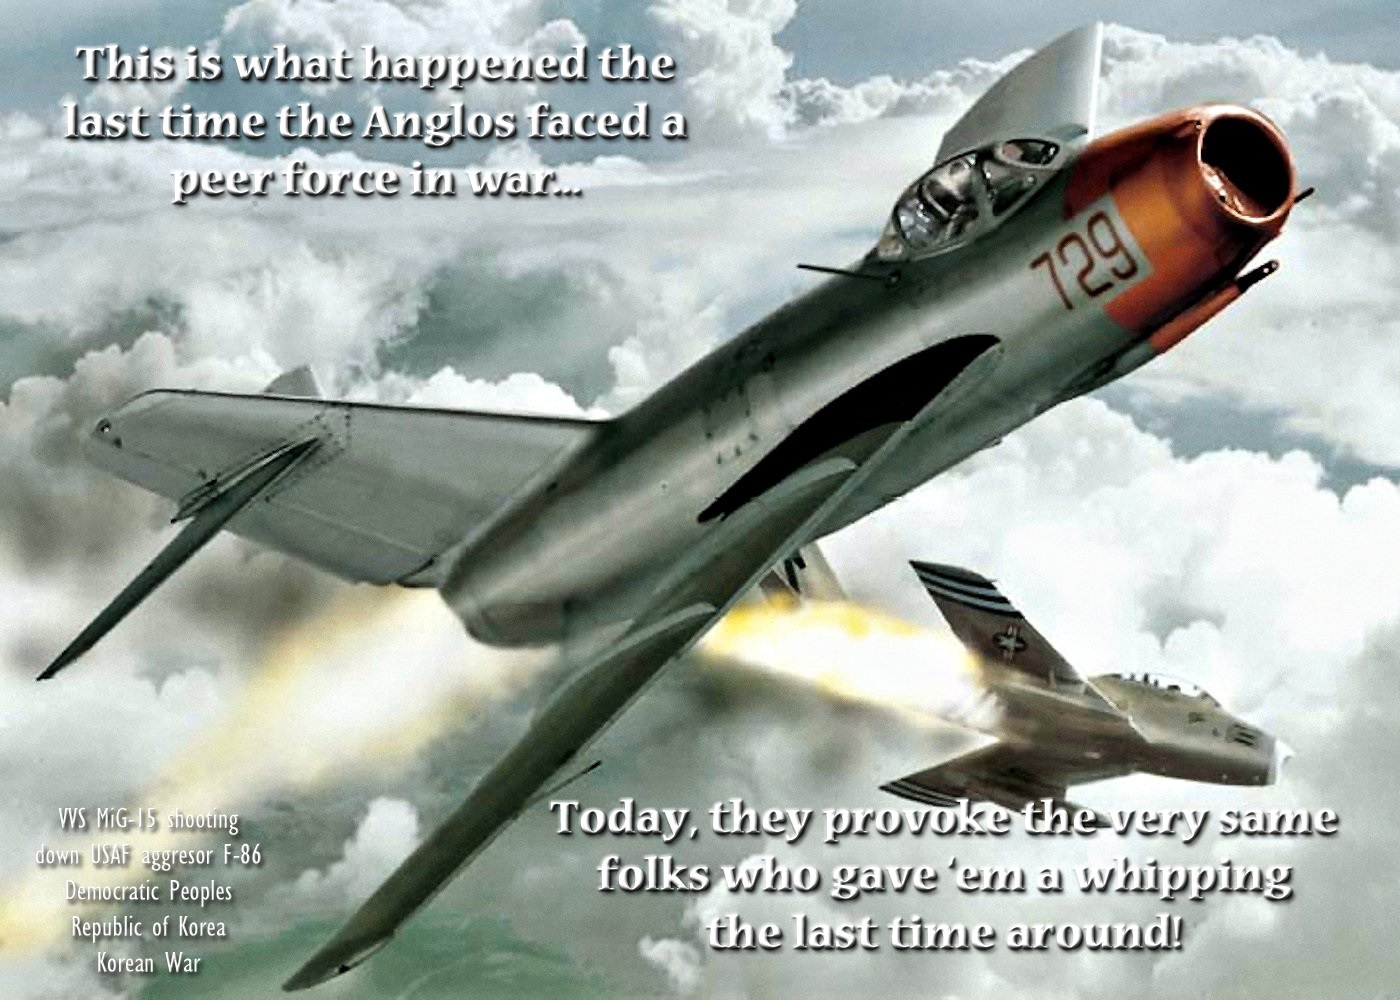 00 Mig-15 shooting down F-86 231215